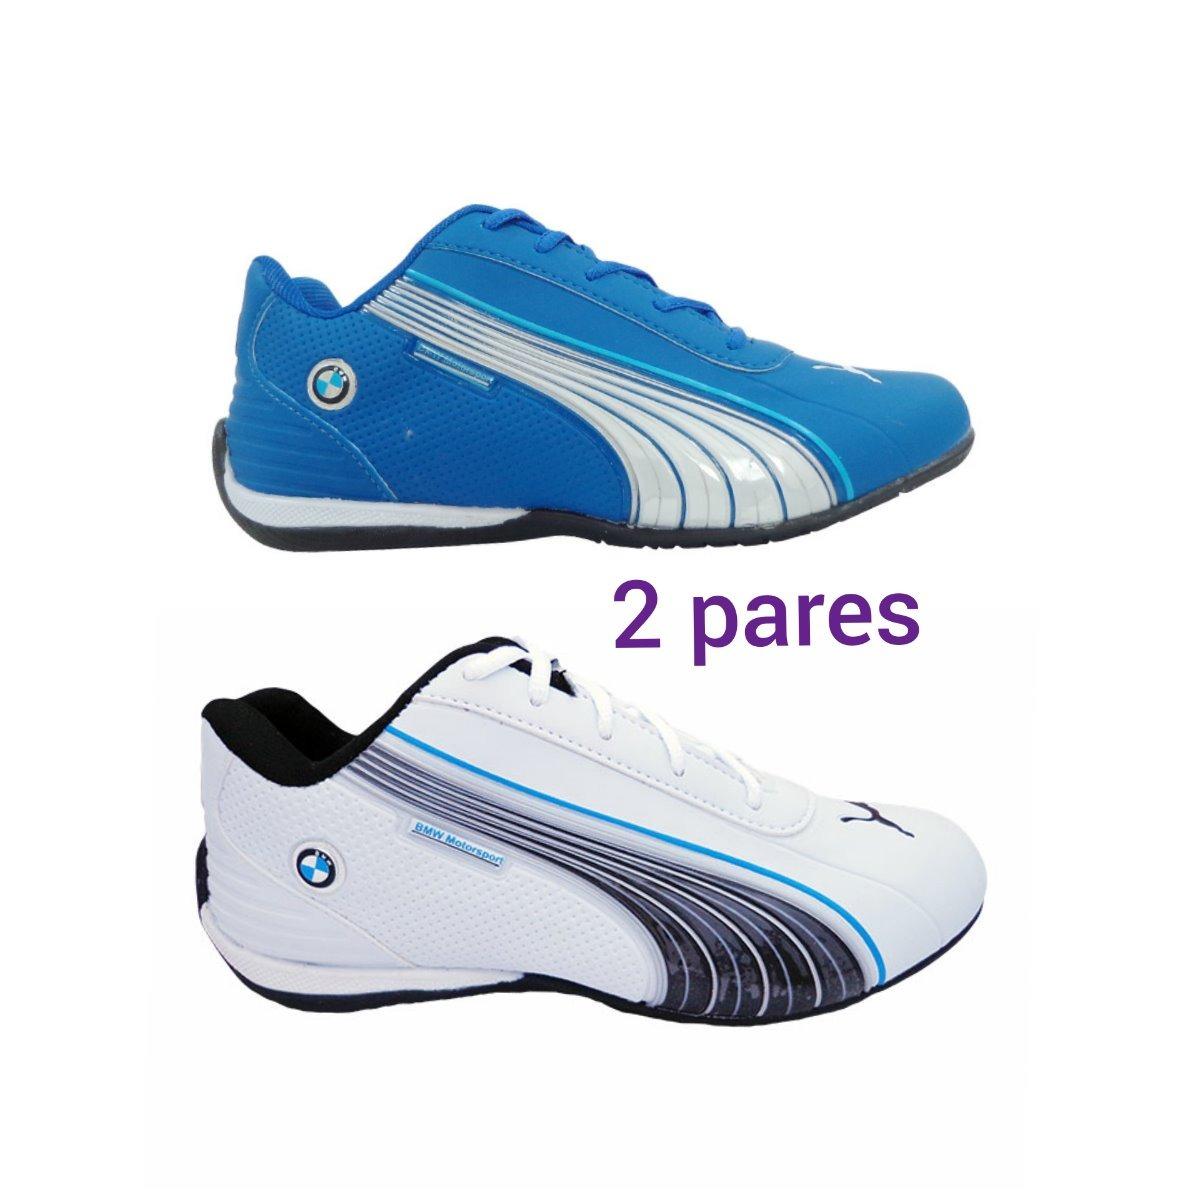 63984da58a2 kit 2 tênis puma bmw motorsport feminino masculino barato. Carregando zoom.